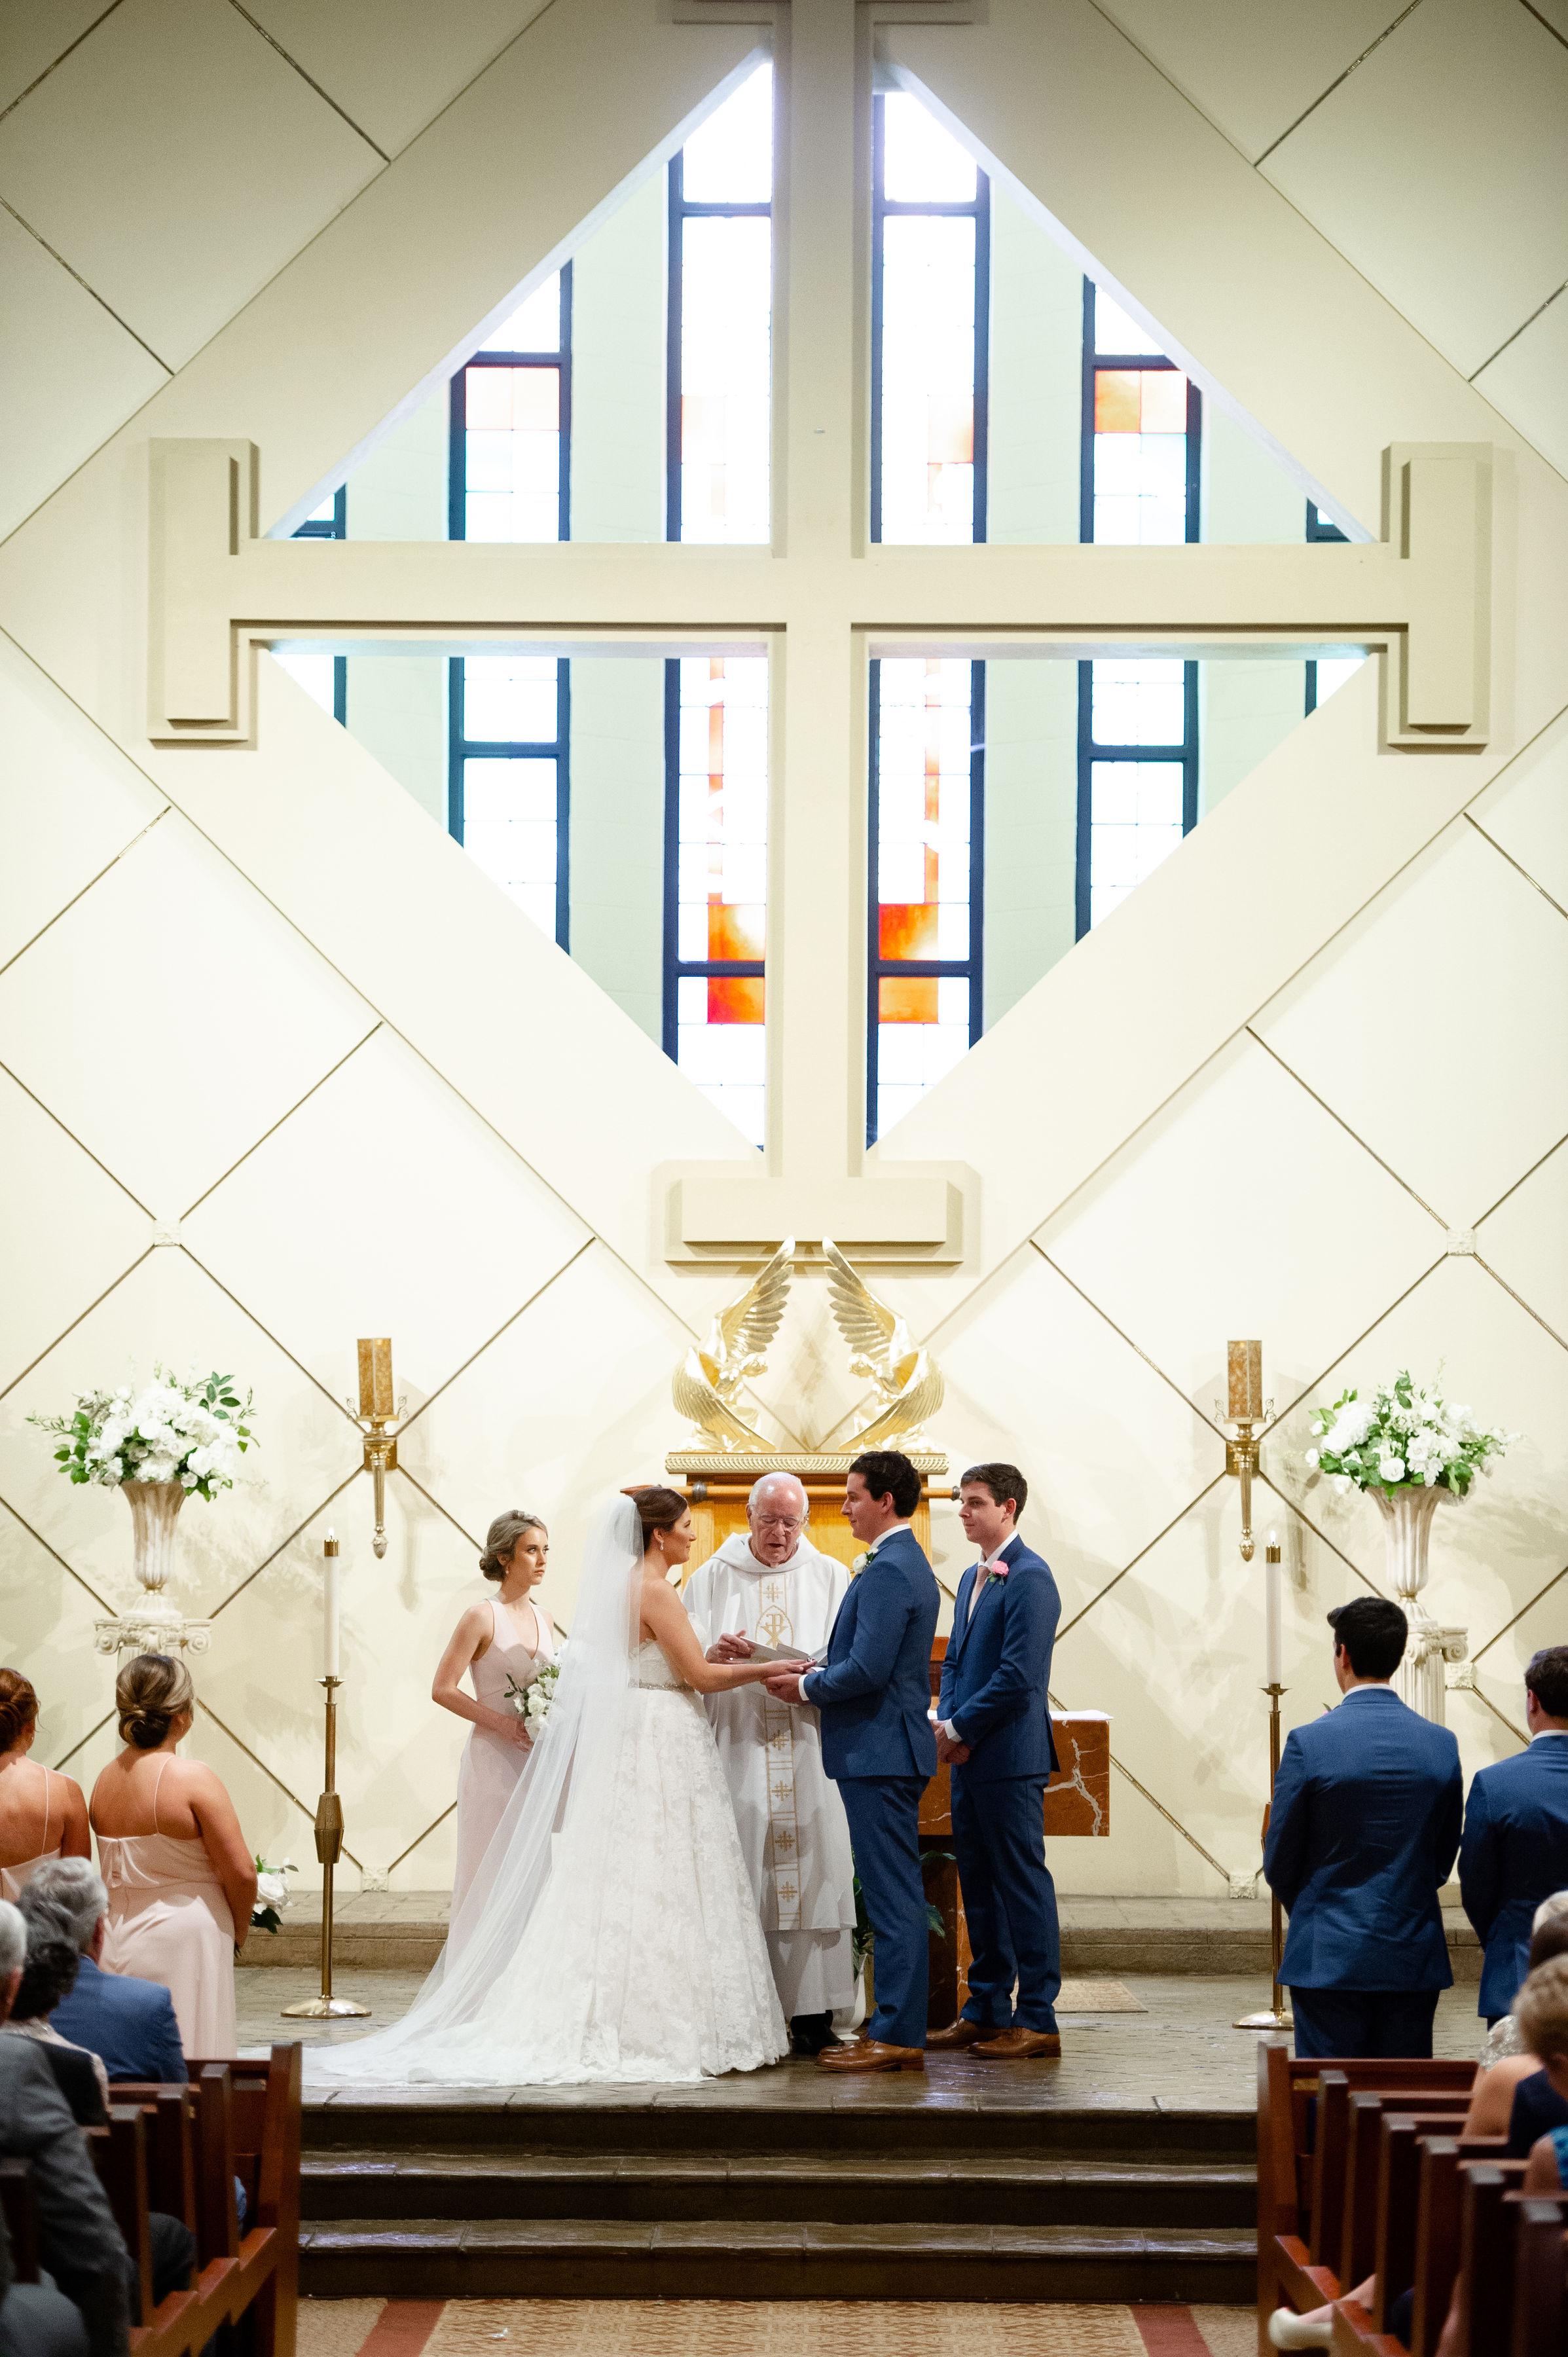 McElravey_Wedding_CarolineLimaPhotography_2018_117.jpg